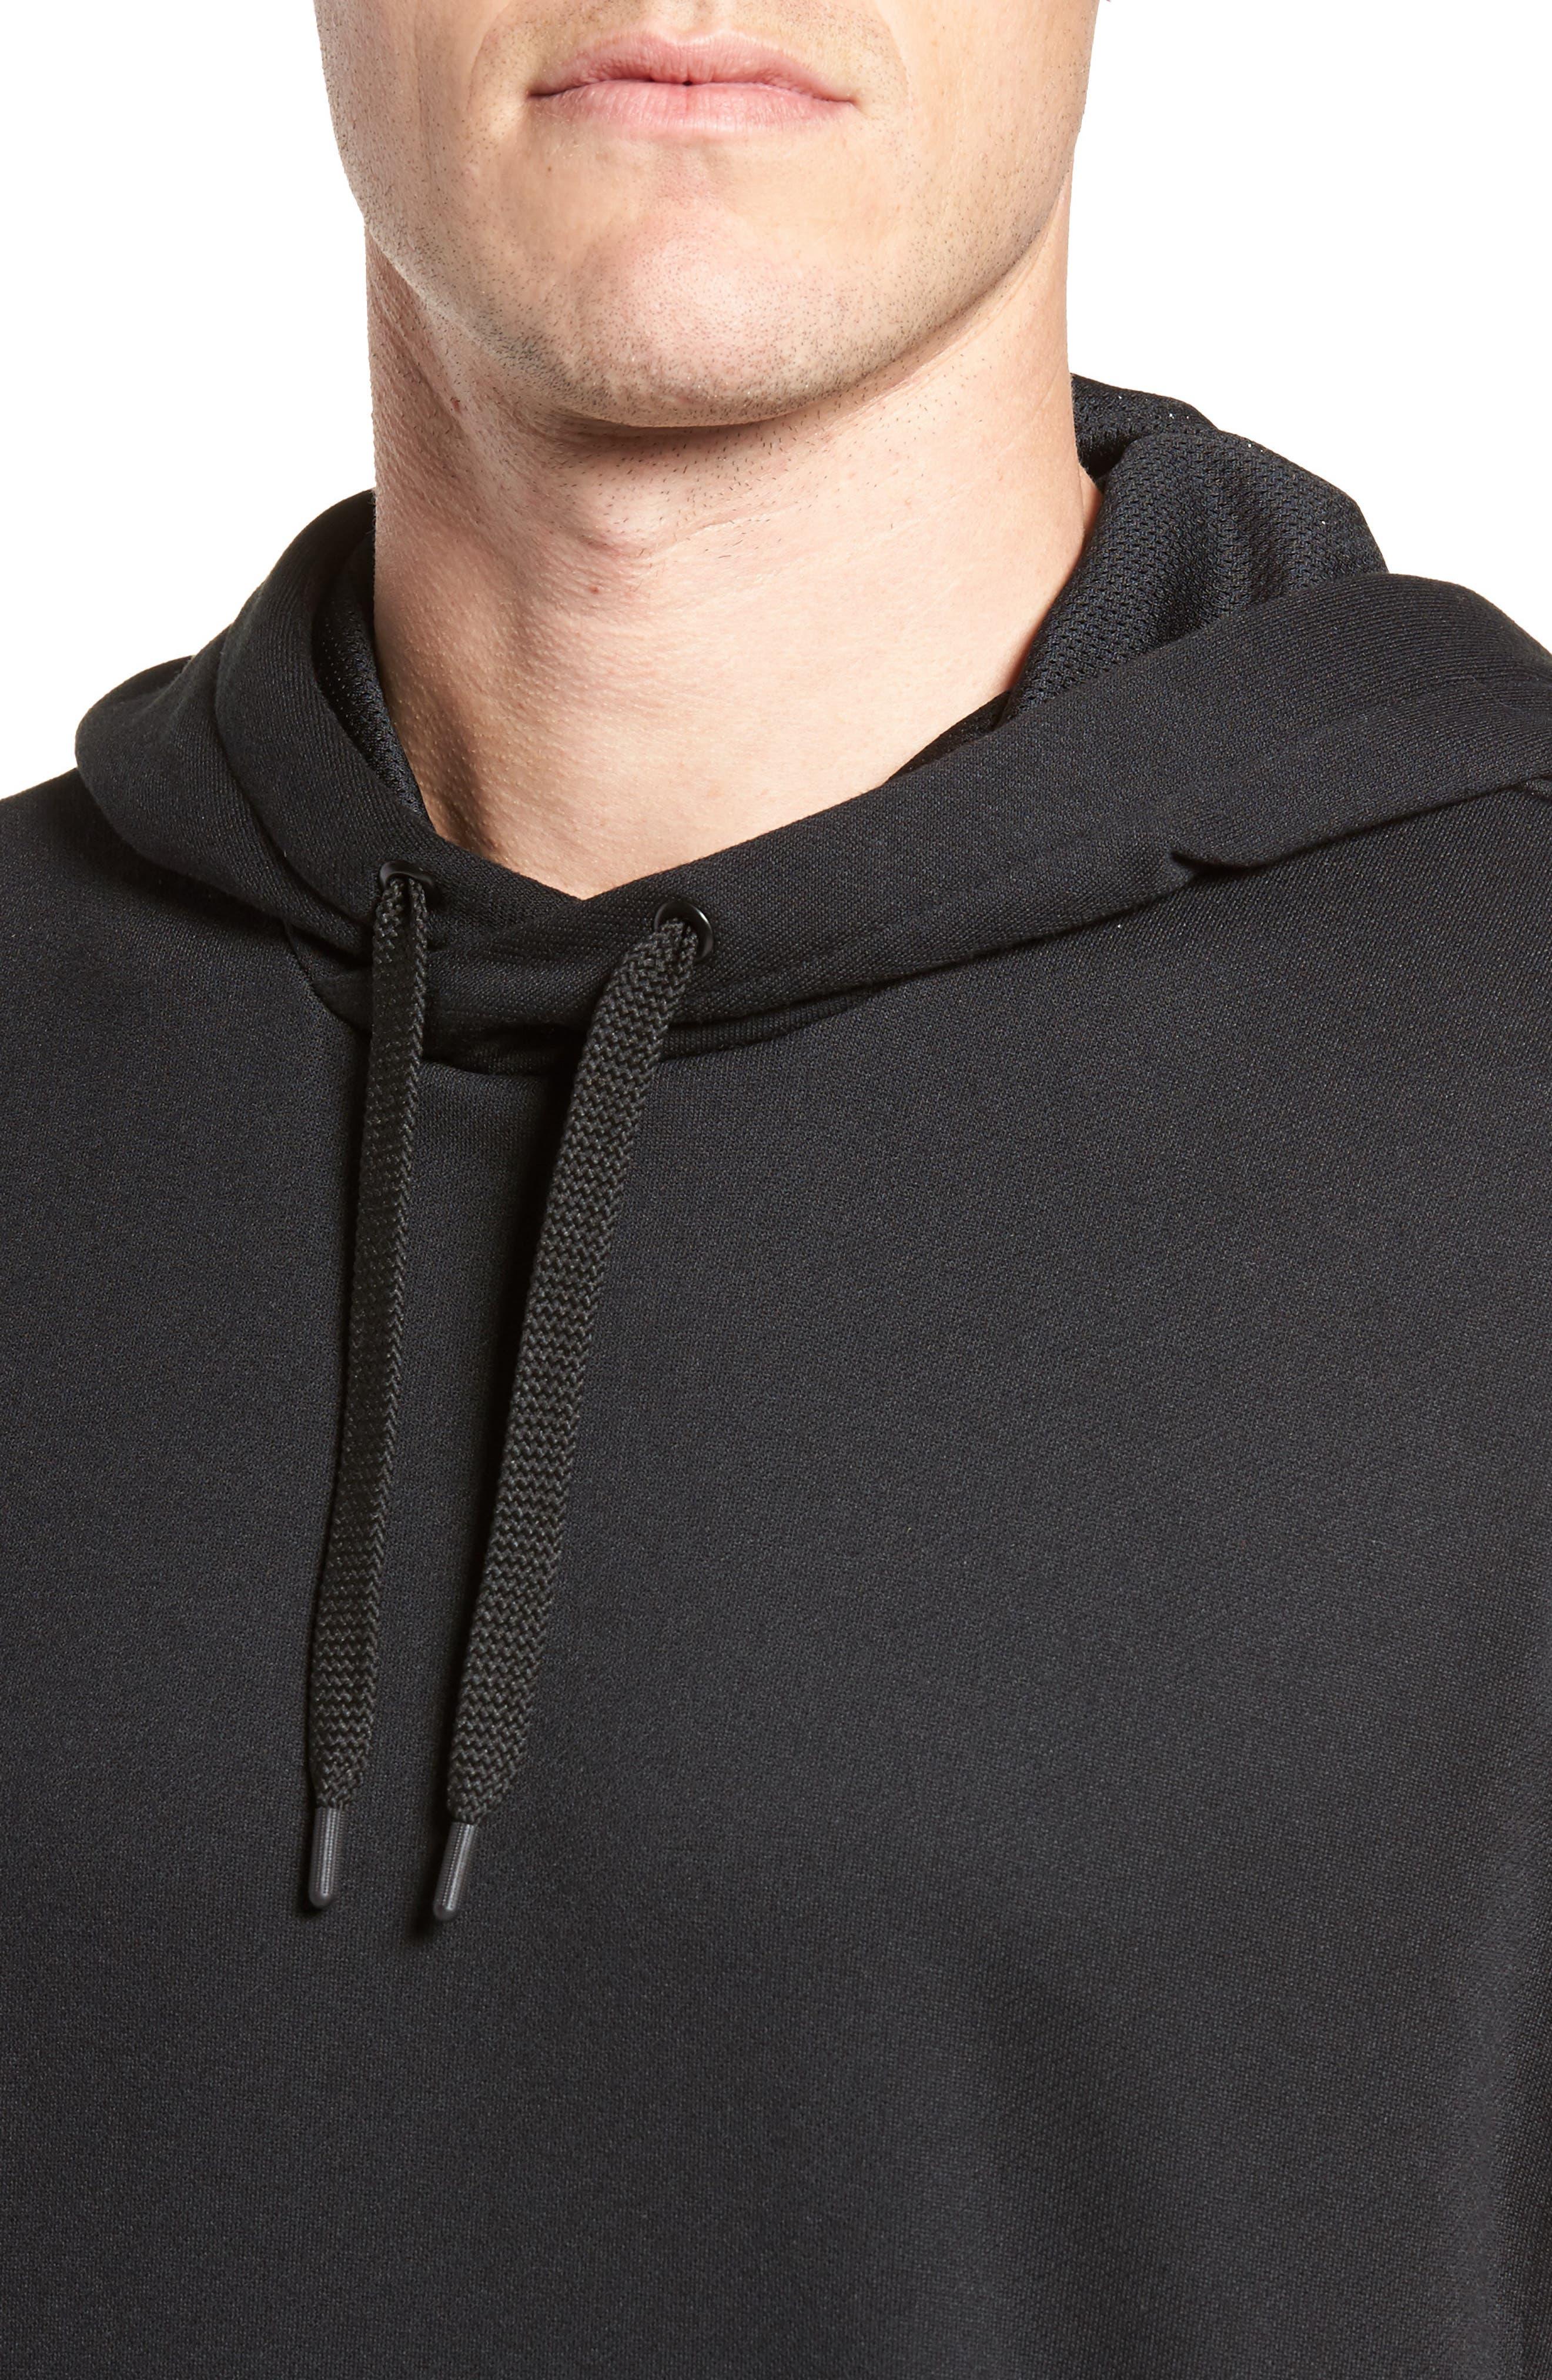 Training Dry Top PX Sleeveless Hoodie,                             Alternate thumbnail 4, color,                             Black/ Black/ White